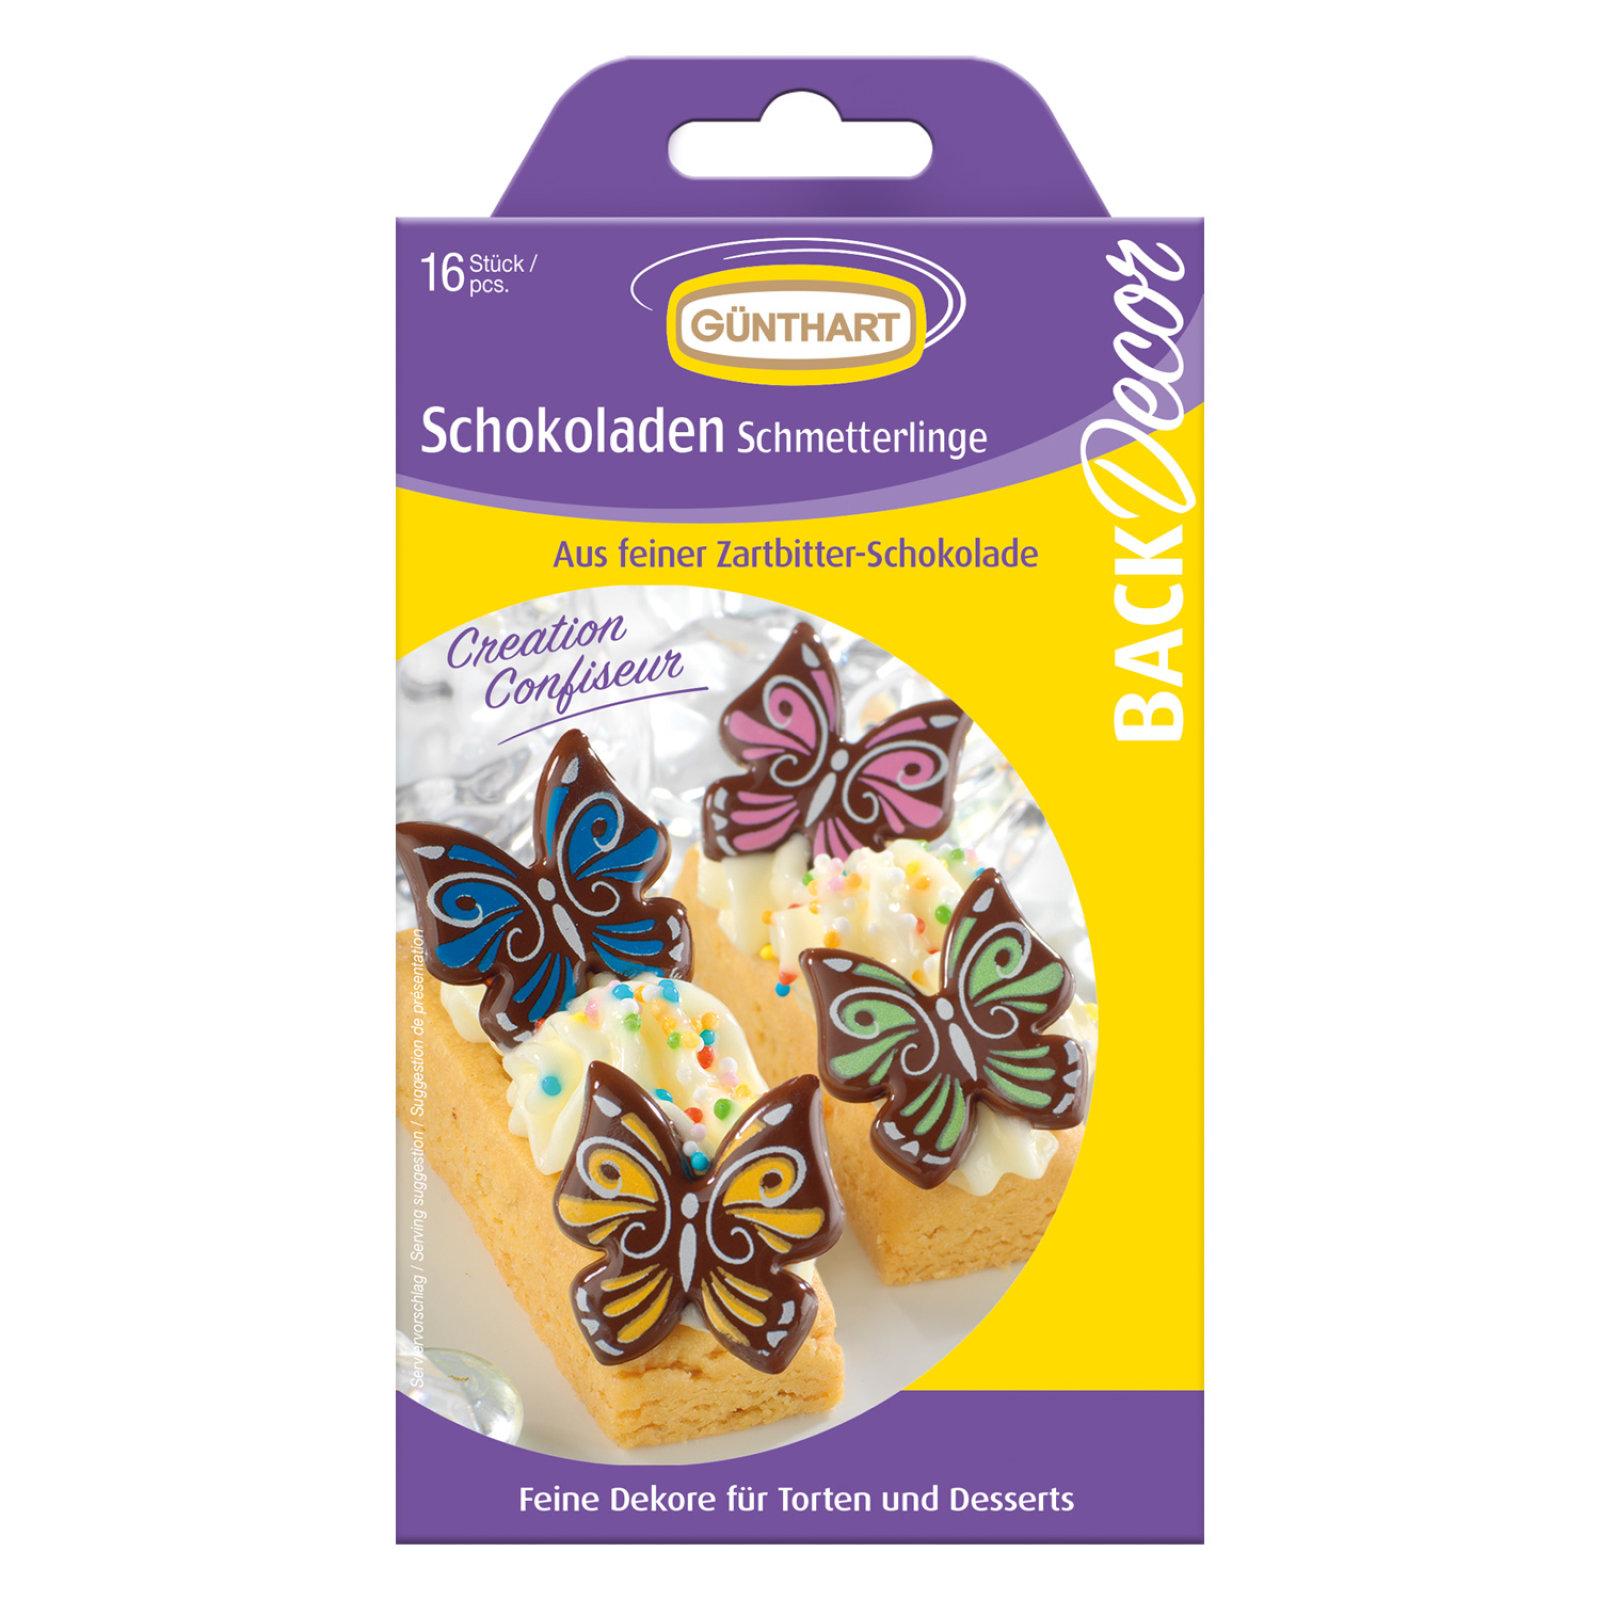 16 Schokoladen Schmetterlinge